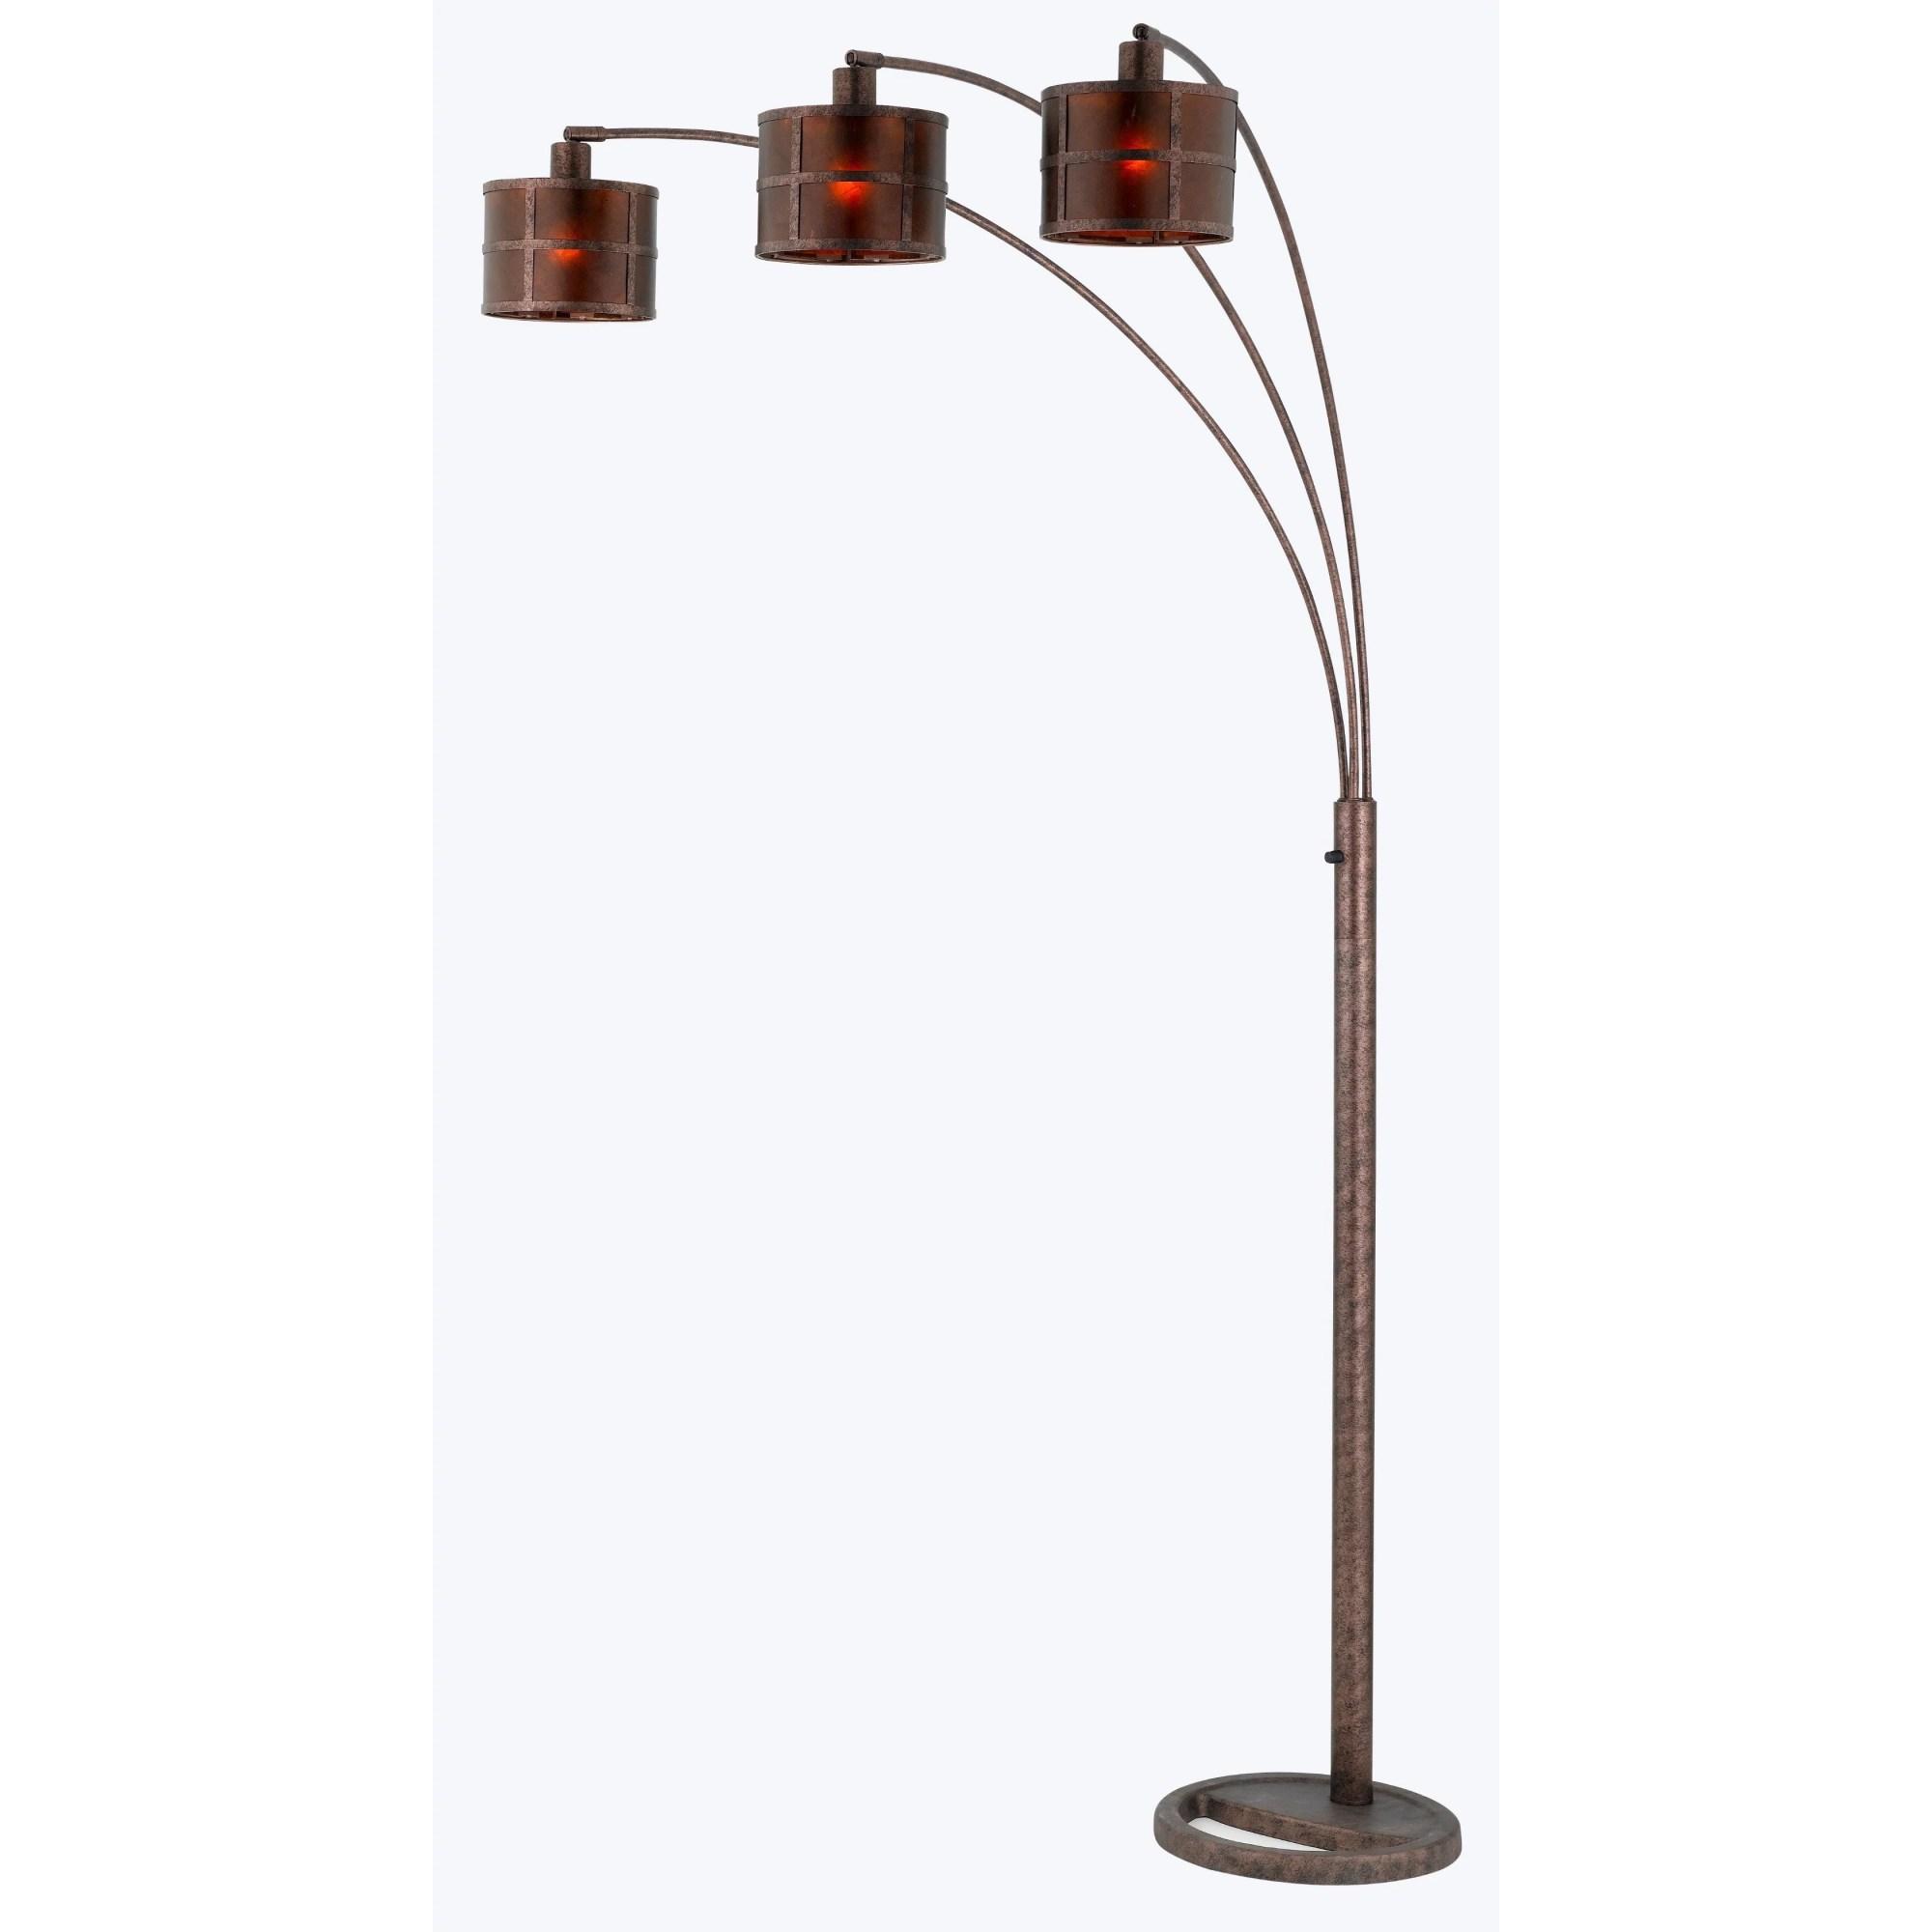 hight resolution of cal lighting bo 2036 mica arc metal floor lamp with 3 way pole switch walmart com